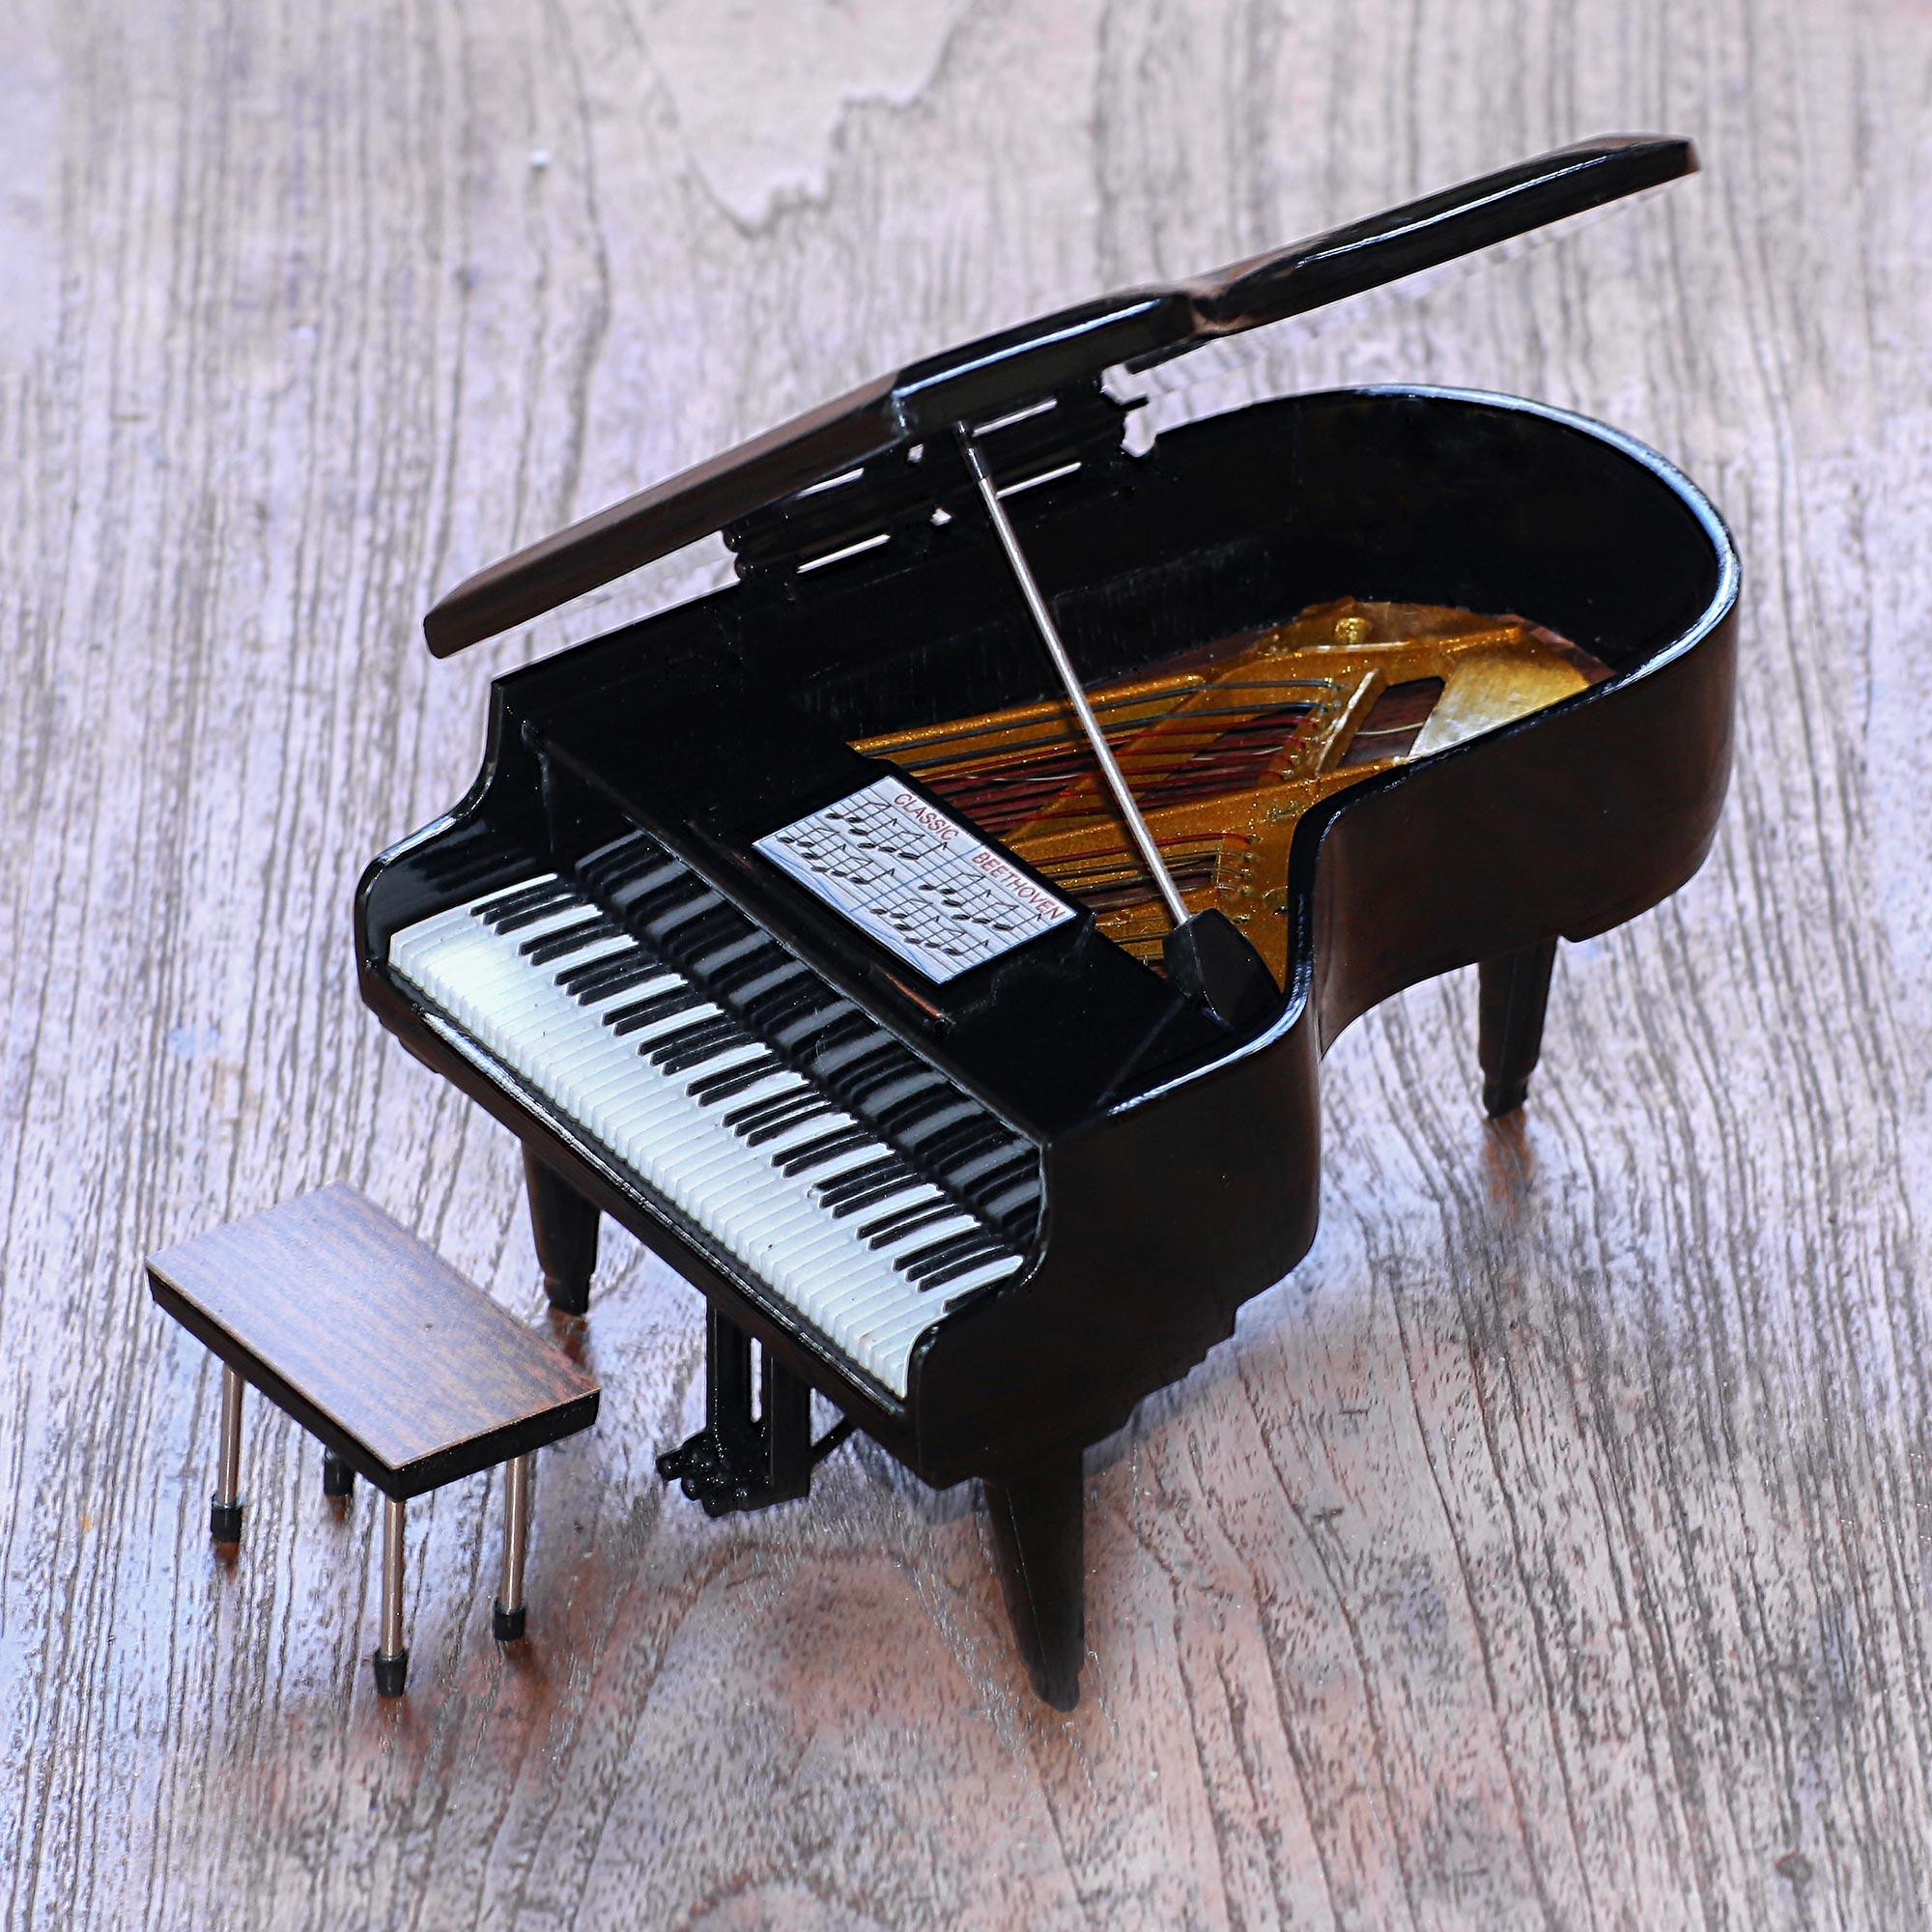 Handcrafted Decorative Mahogany Mini Grand Piano Figurine - Baby Grand |  NOVICA